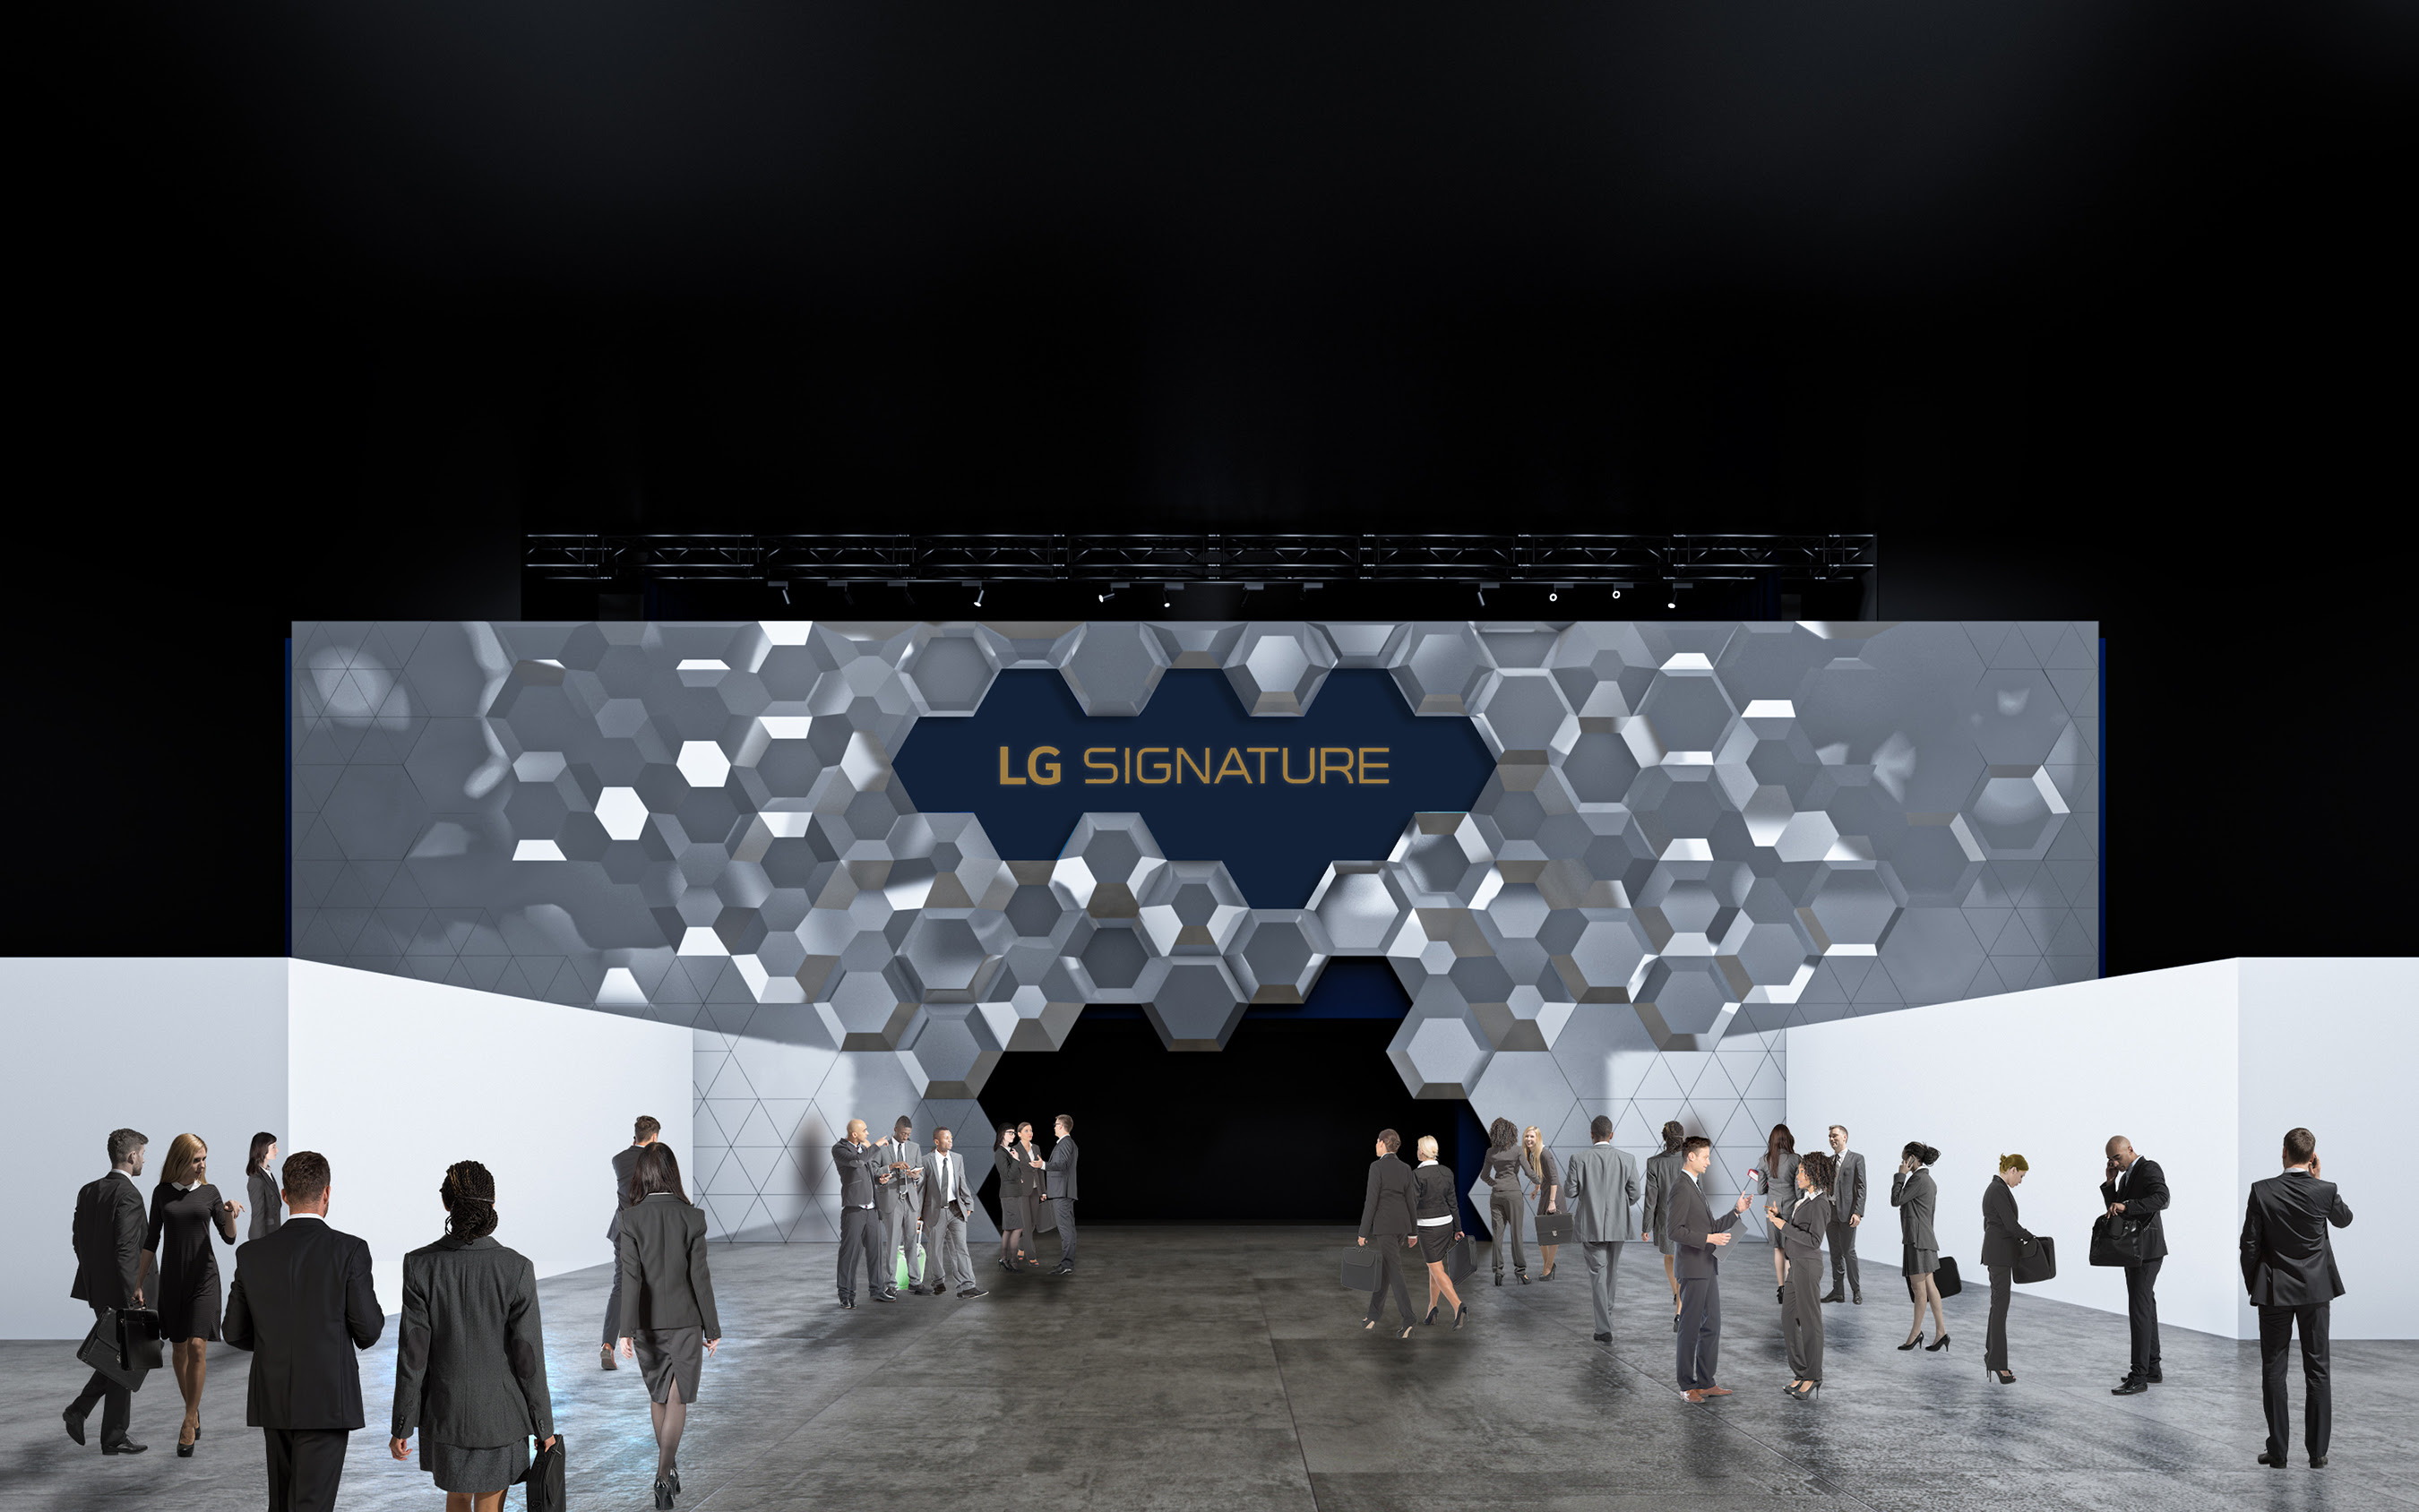 LG SIGNATURE at IFA 2019